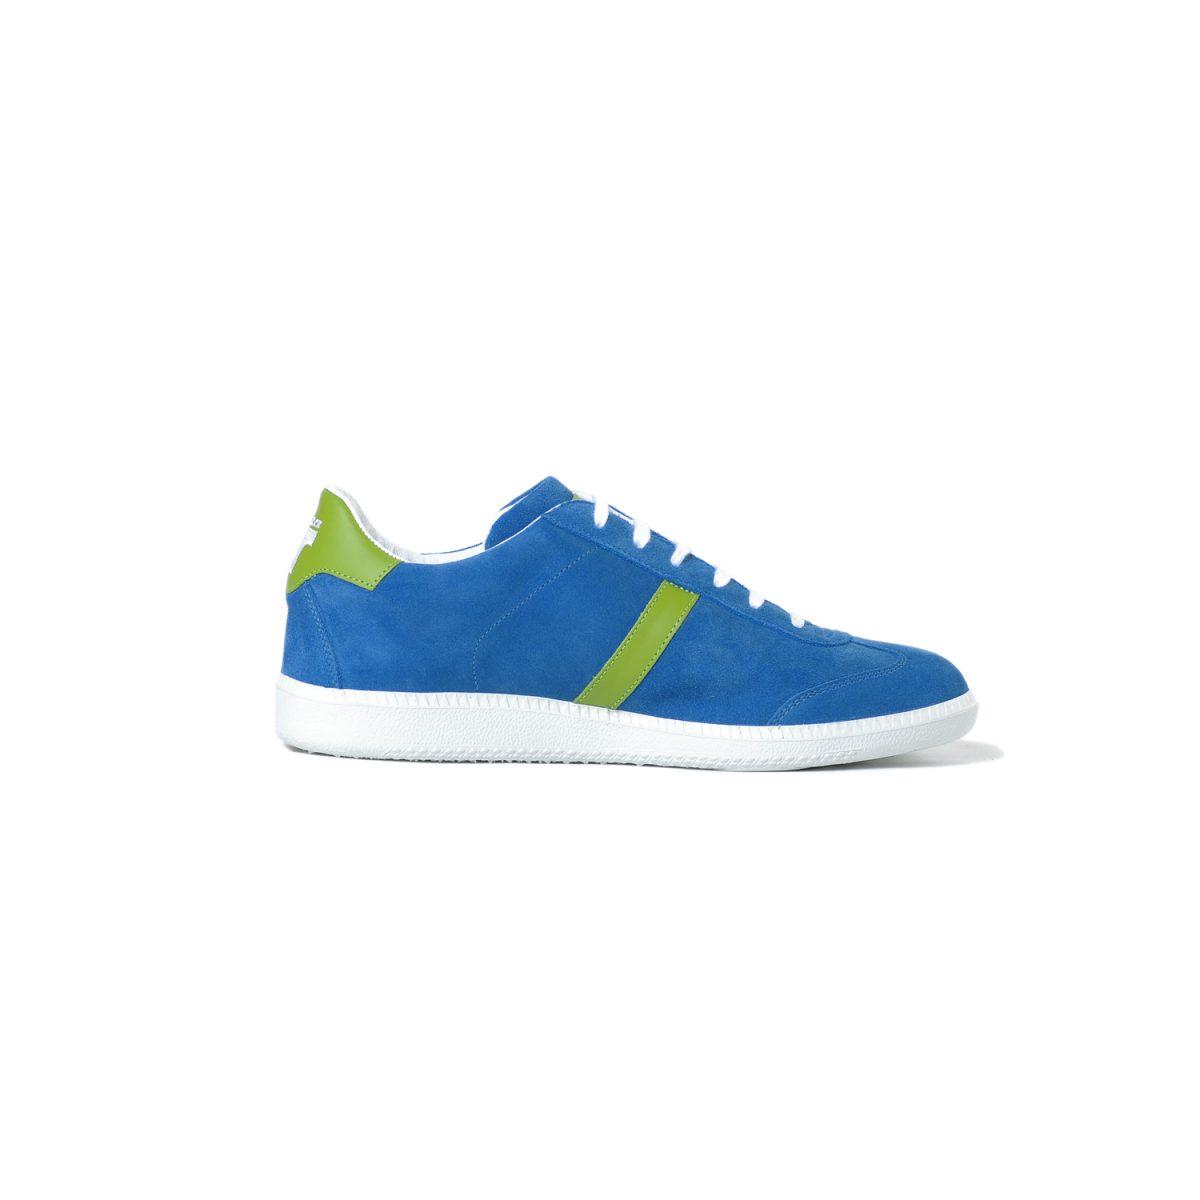 Tisza cipő - Comfort - Royal-lime